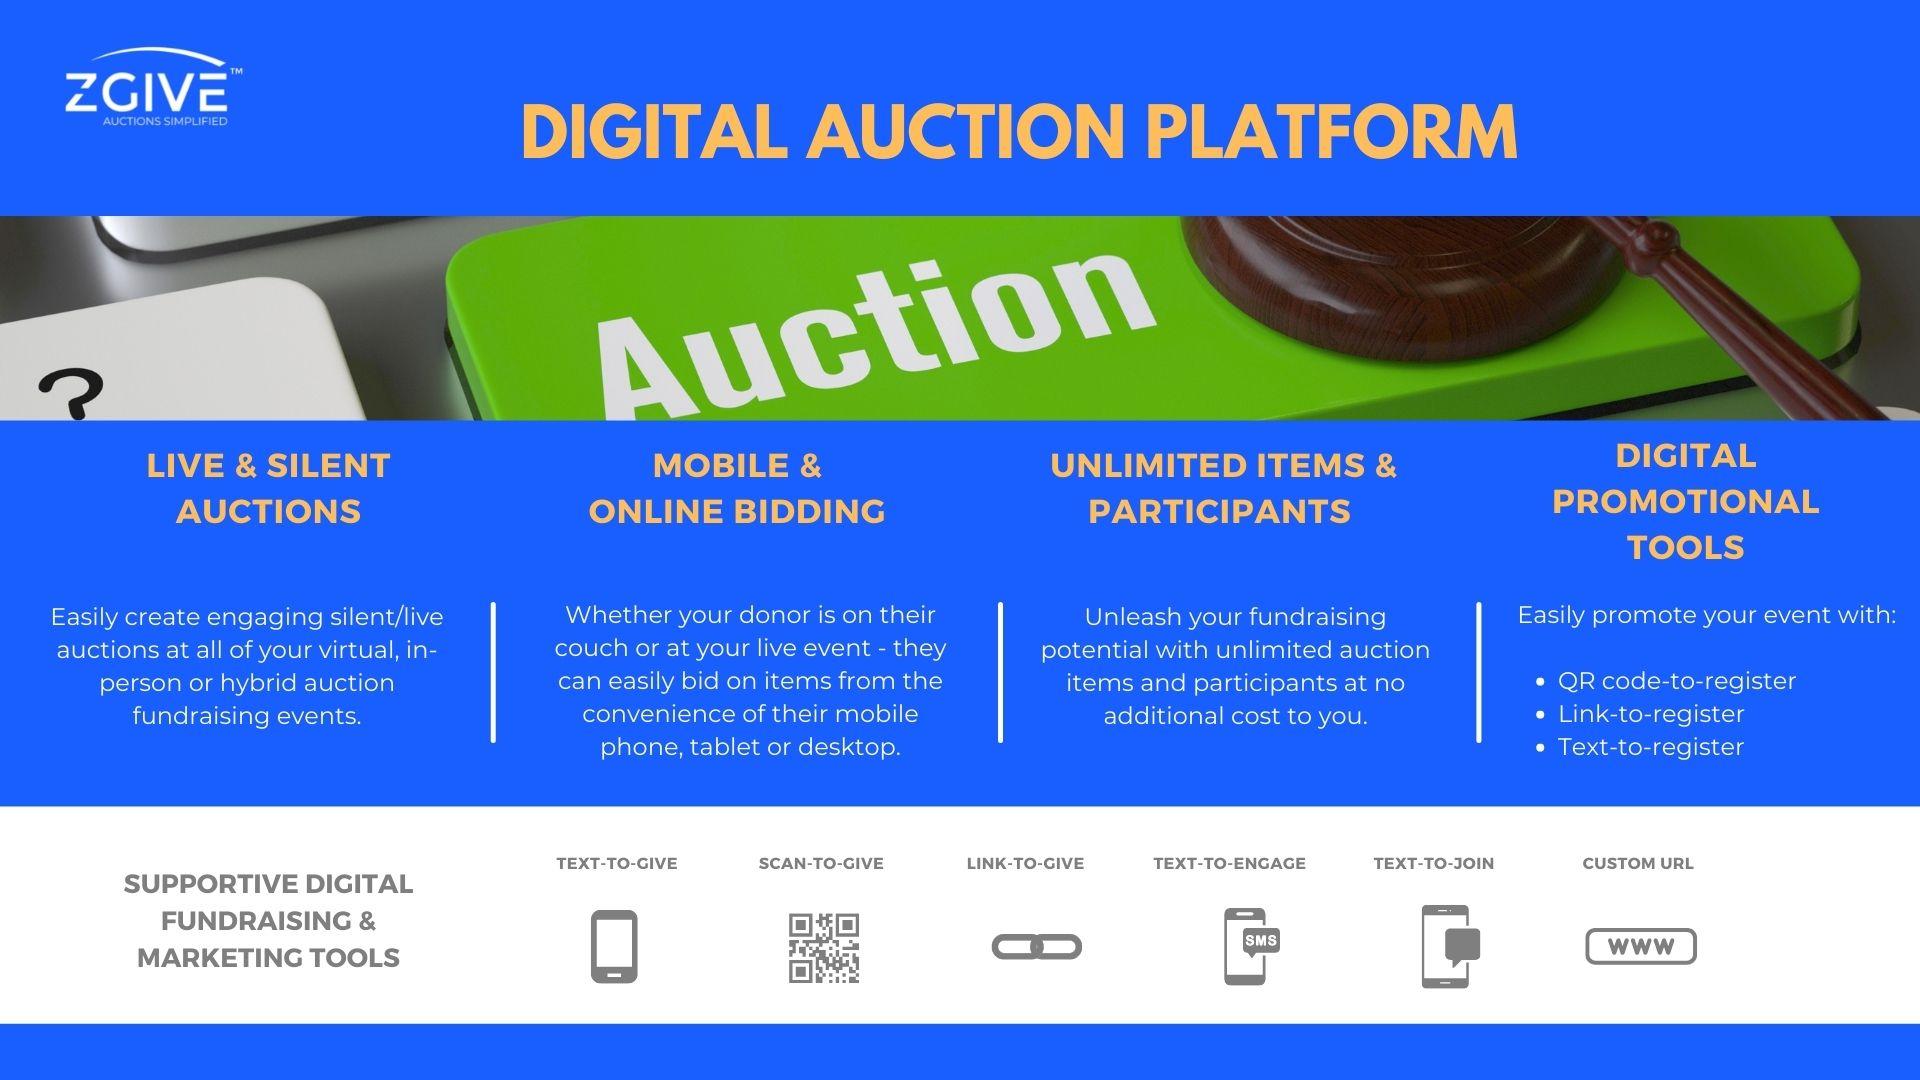 ZGIVE Digital Auction Platform Offerings